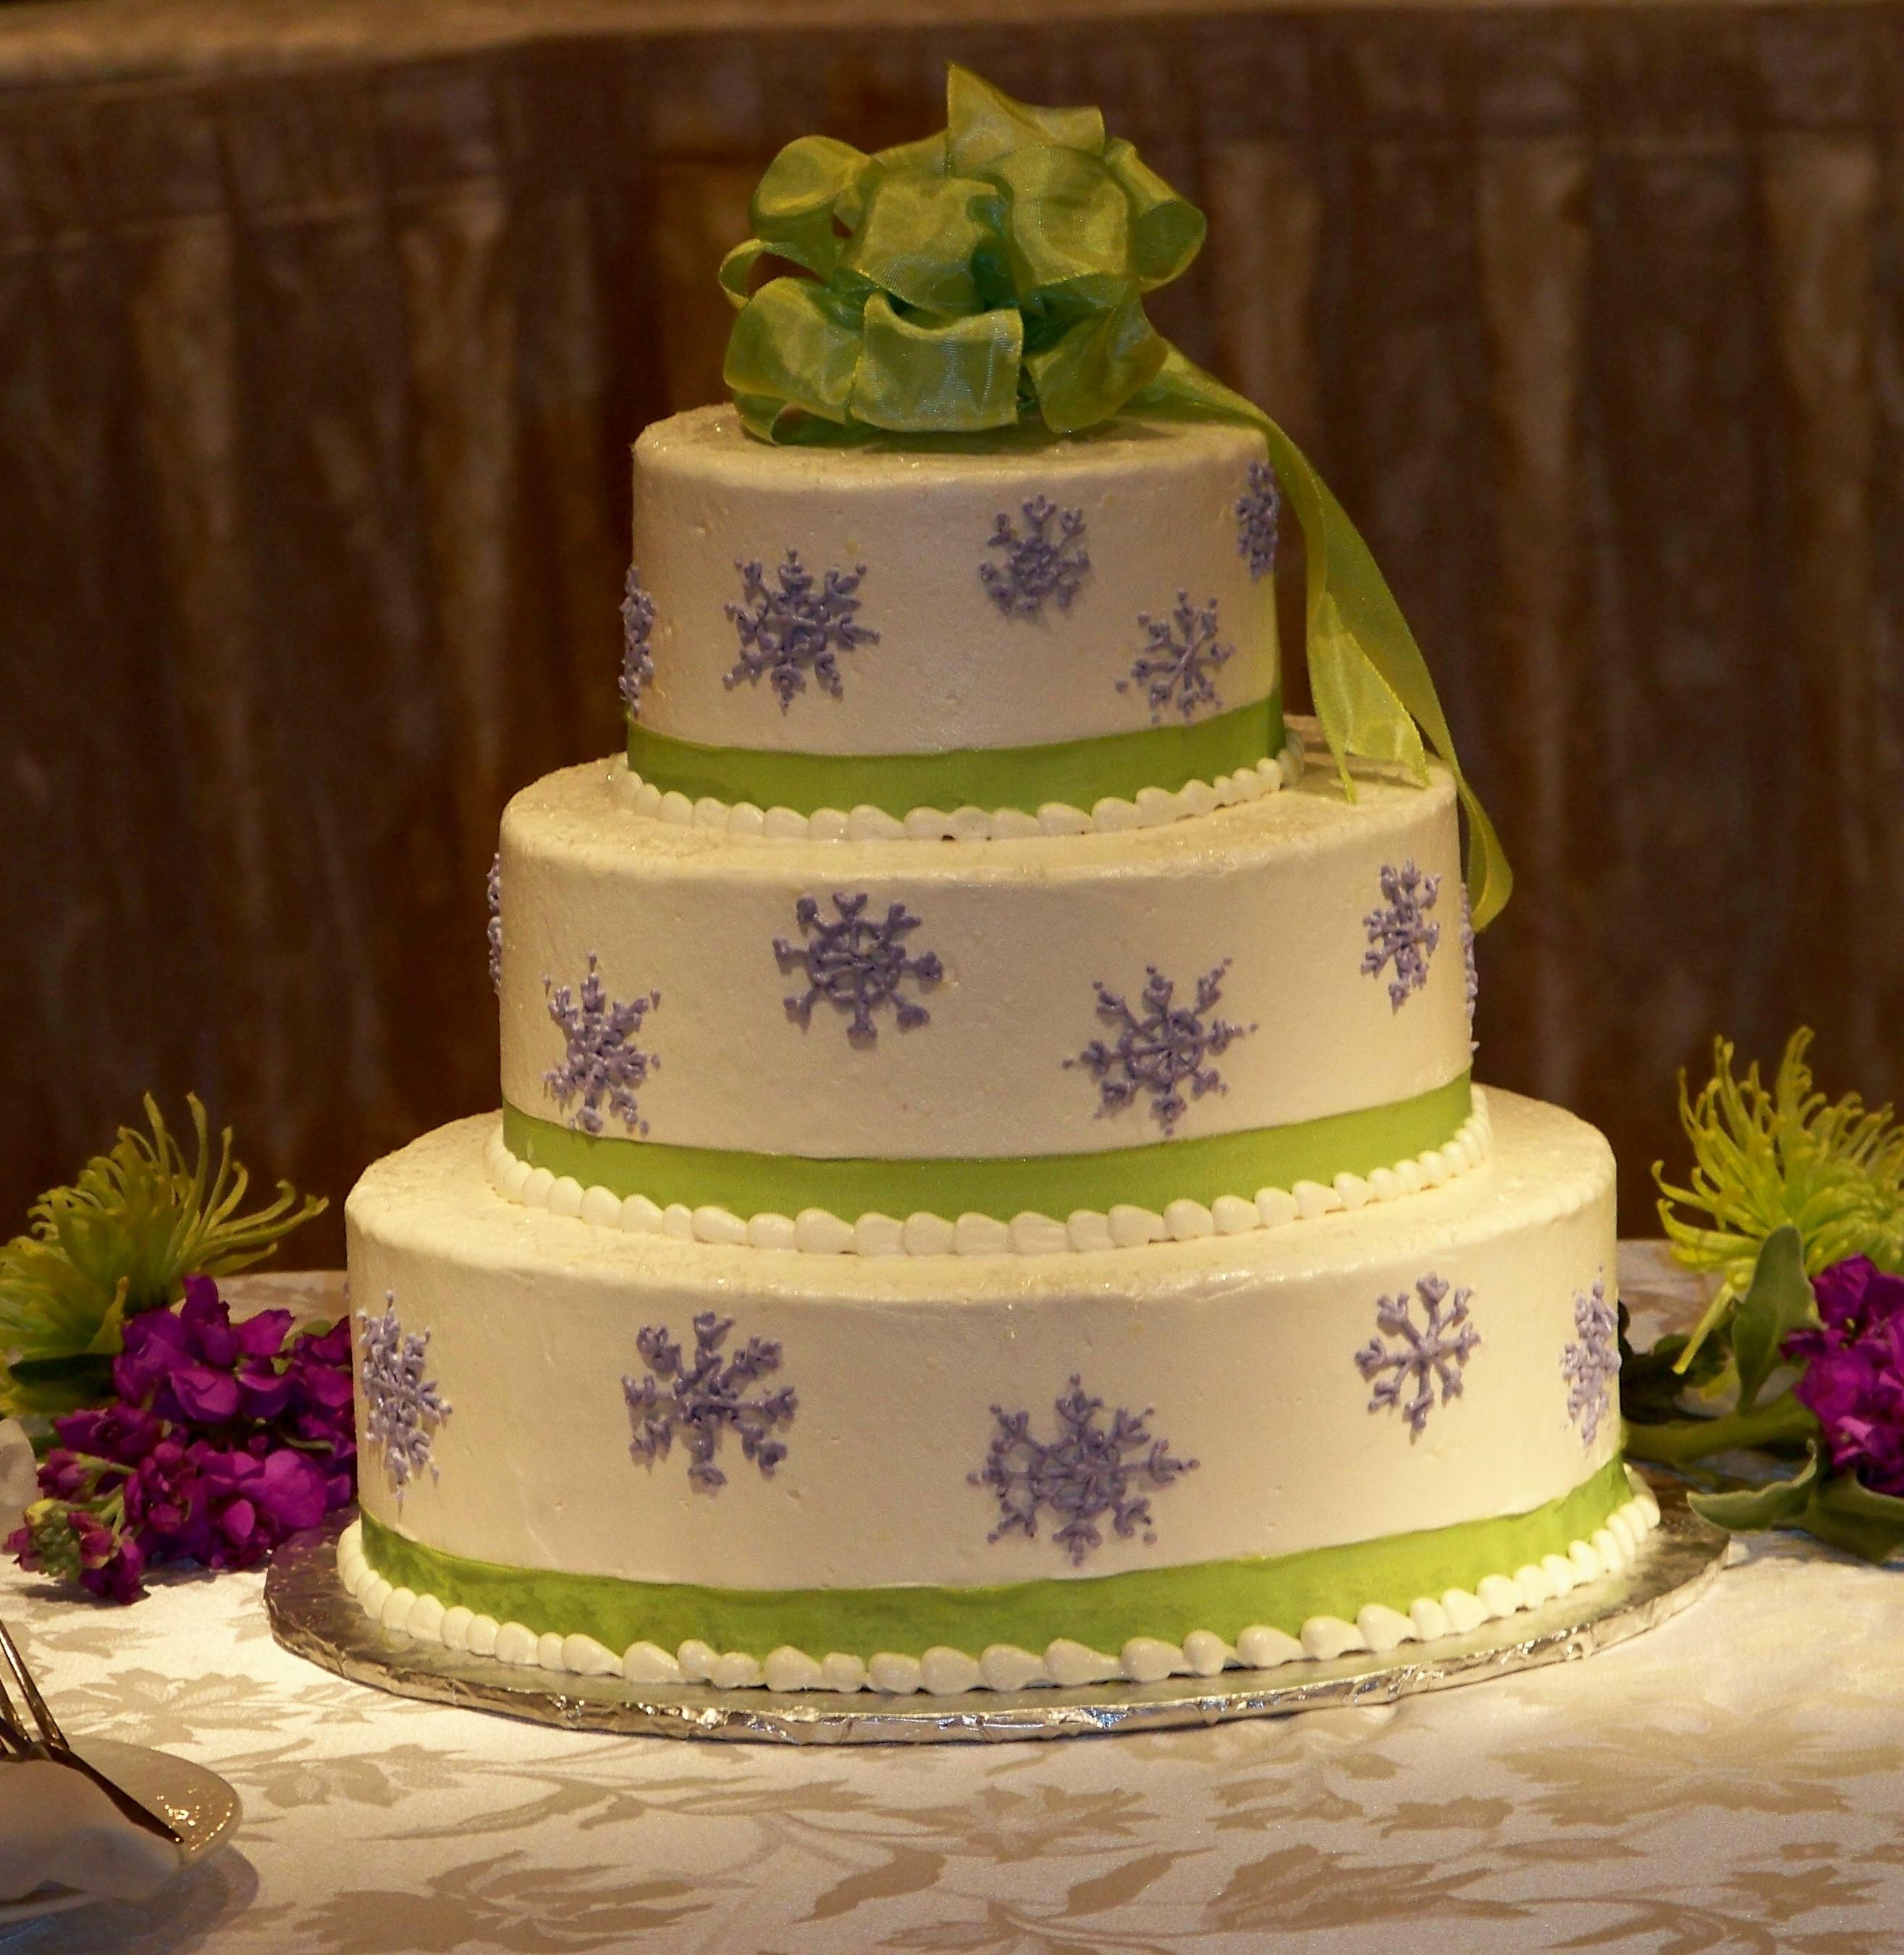 Vegan Wedding Cakes